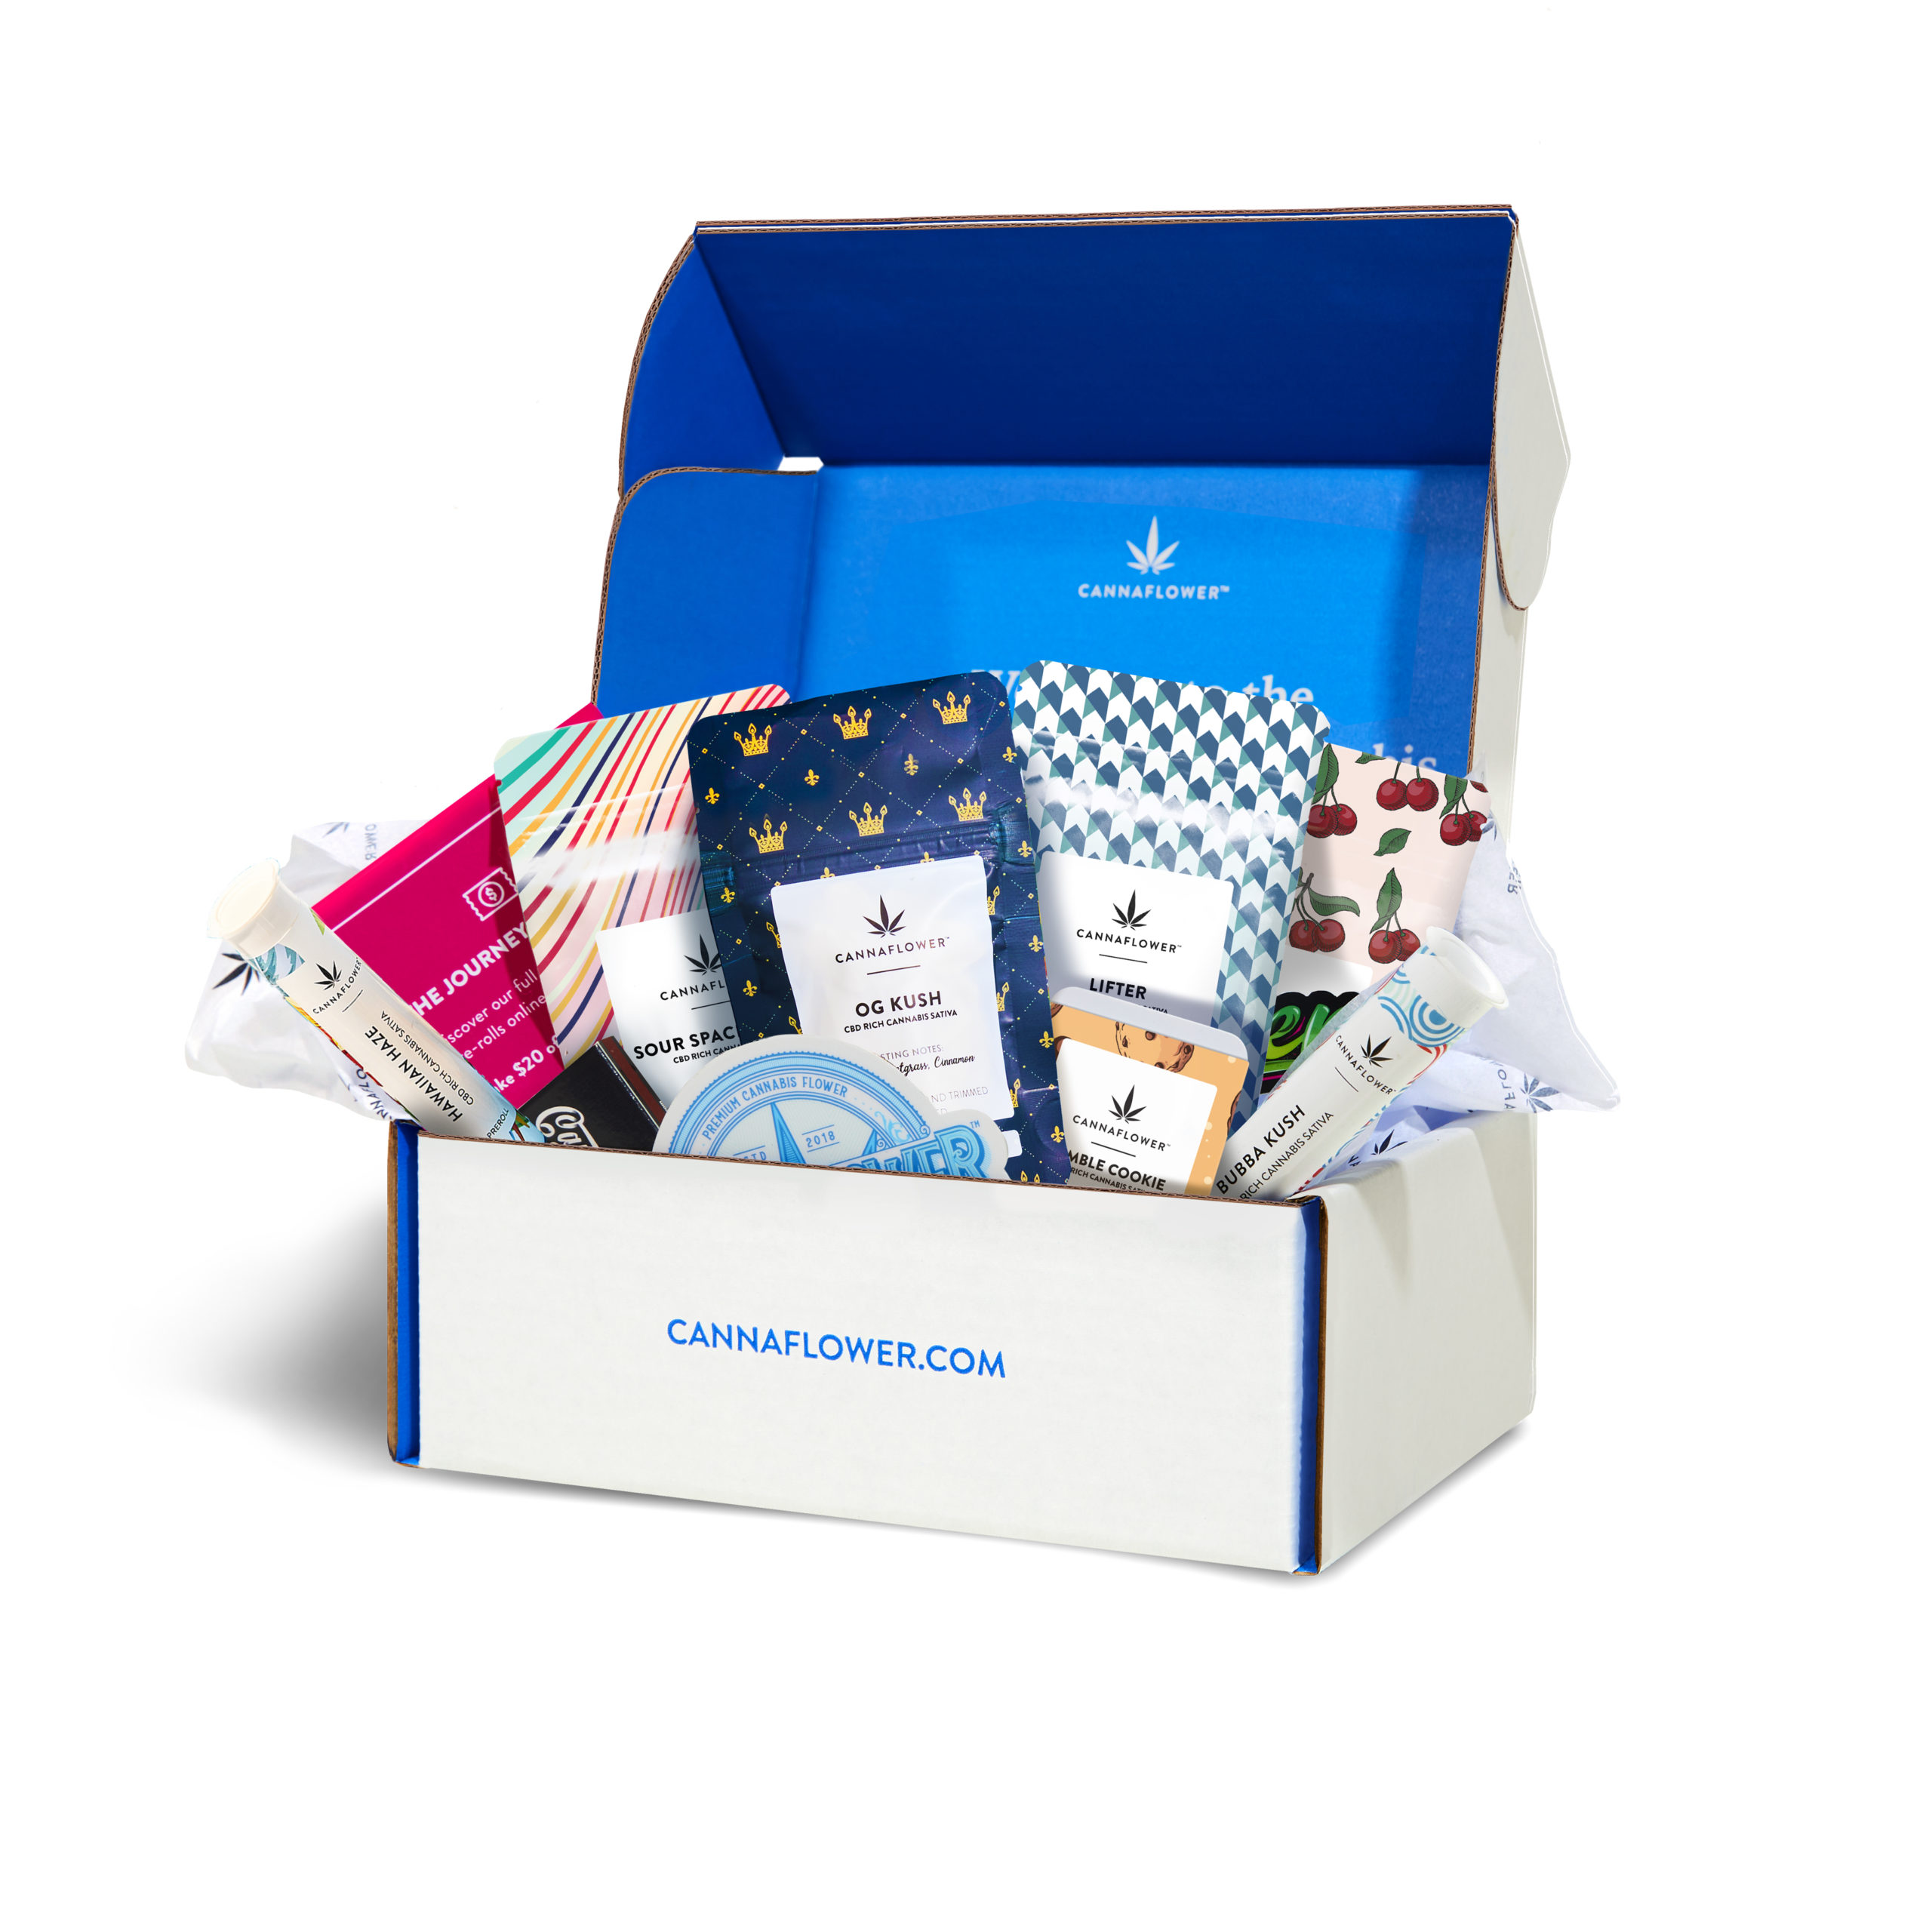 Cannaflower Voyager Box Featured